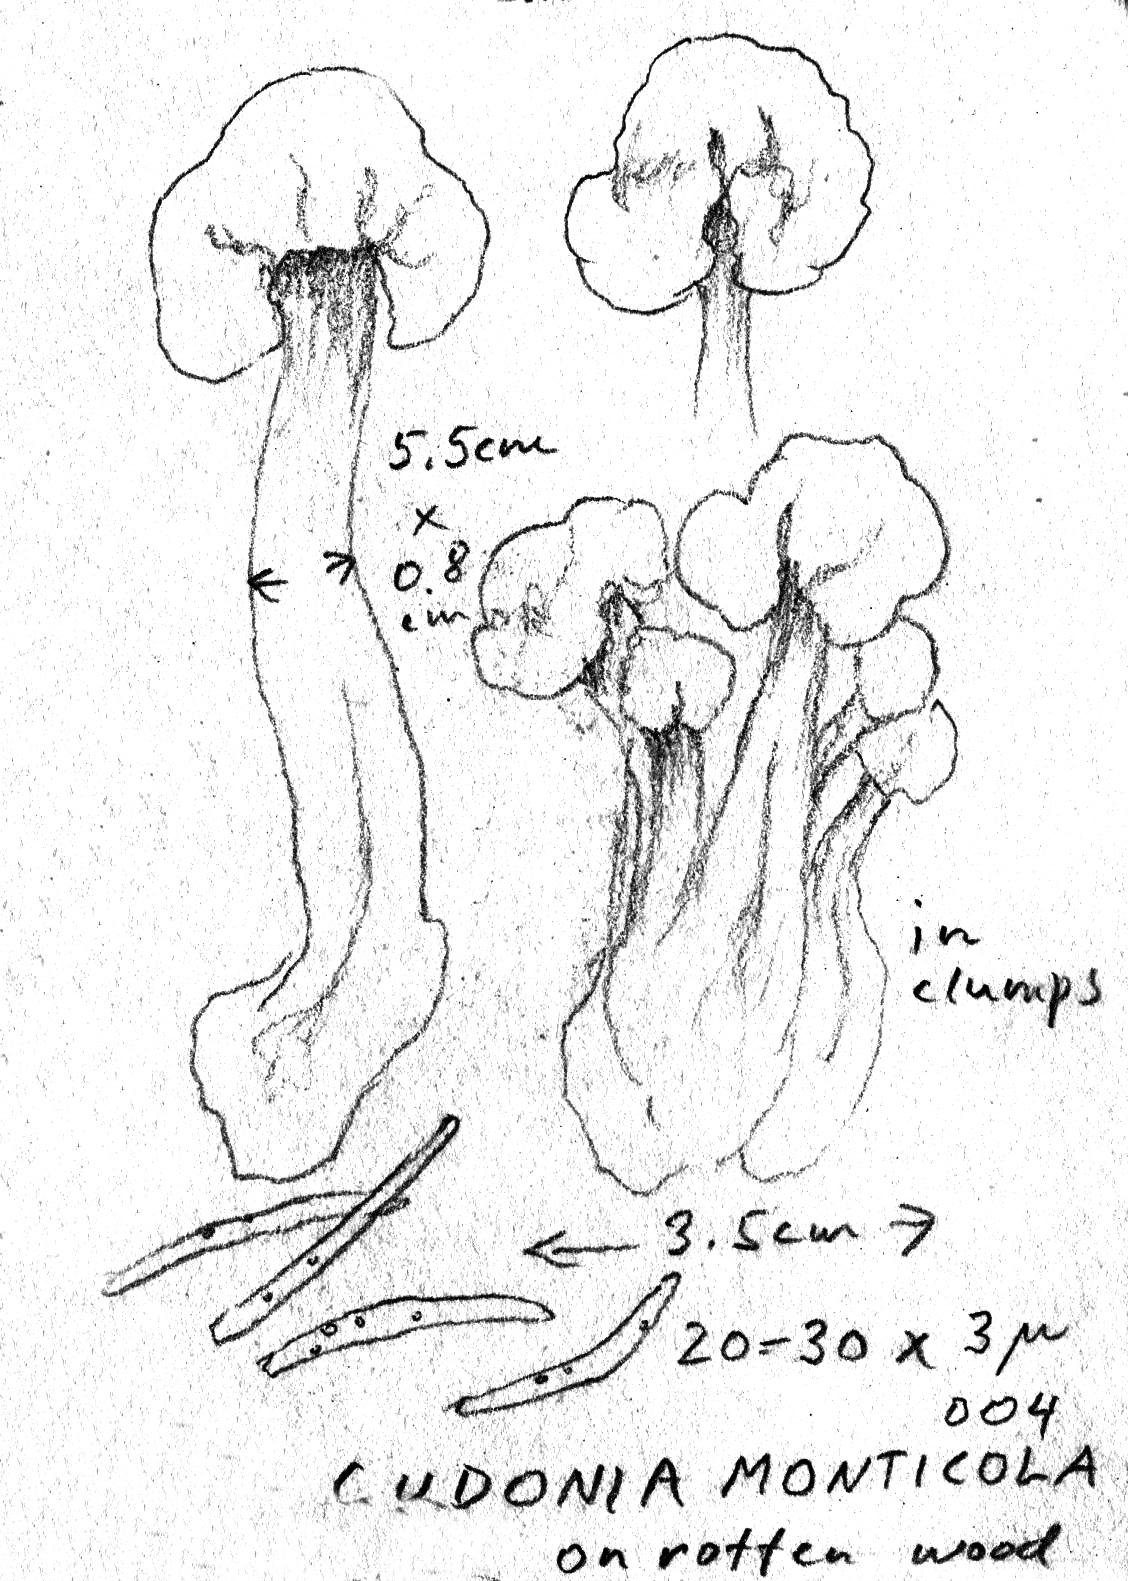 Pachycudonia monticola image